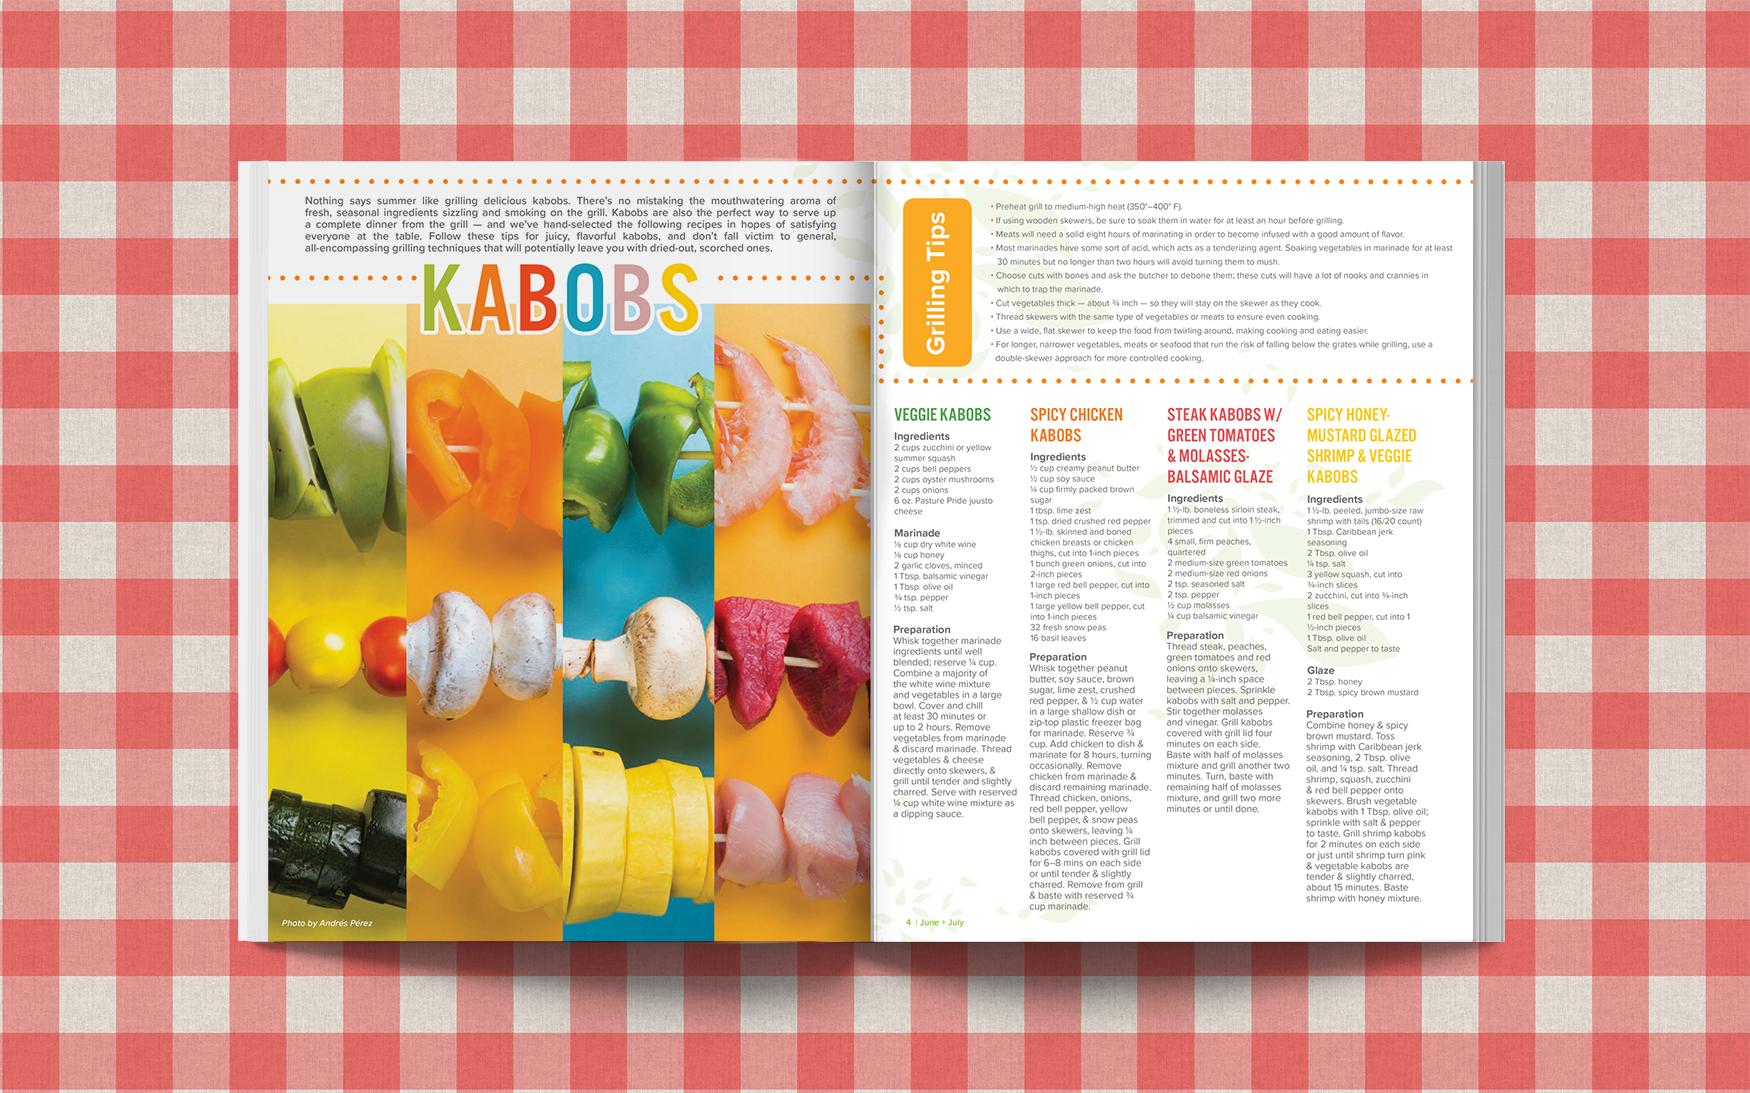 kabobs_mantel_small.jpg